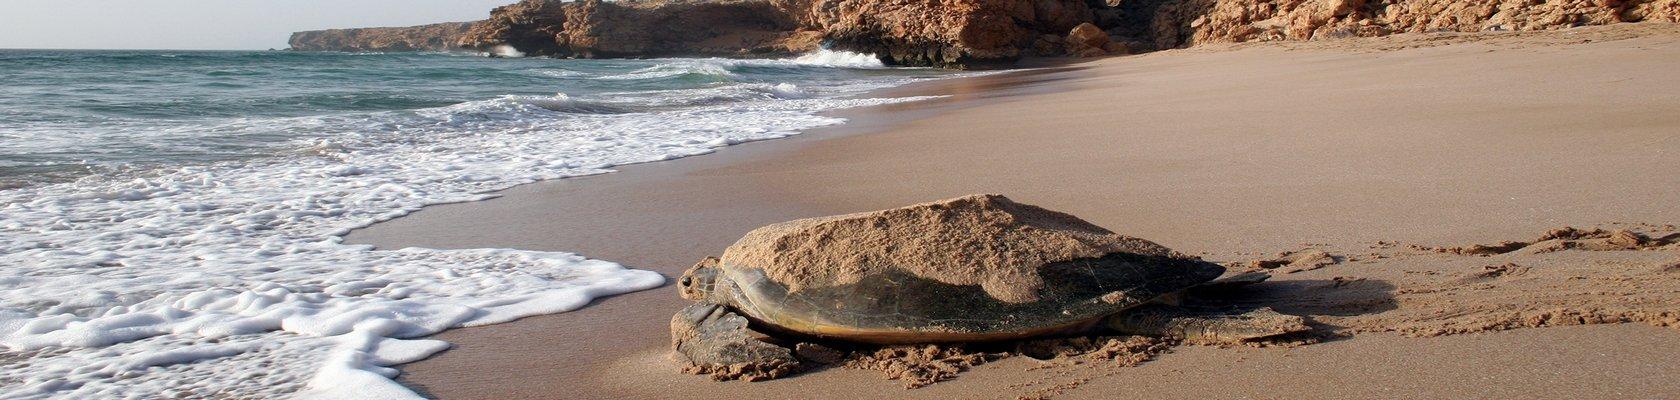 Schildpad, Ras al Hadd